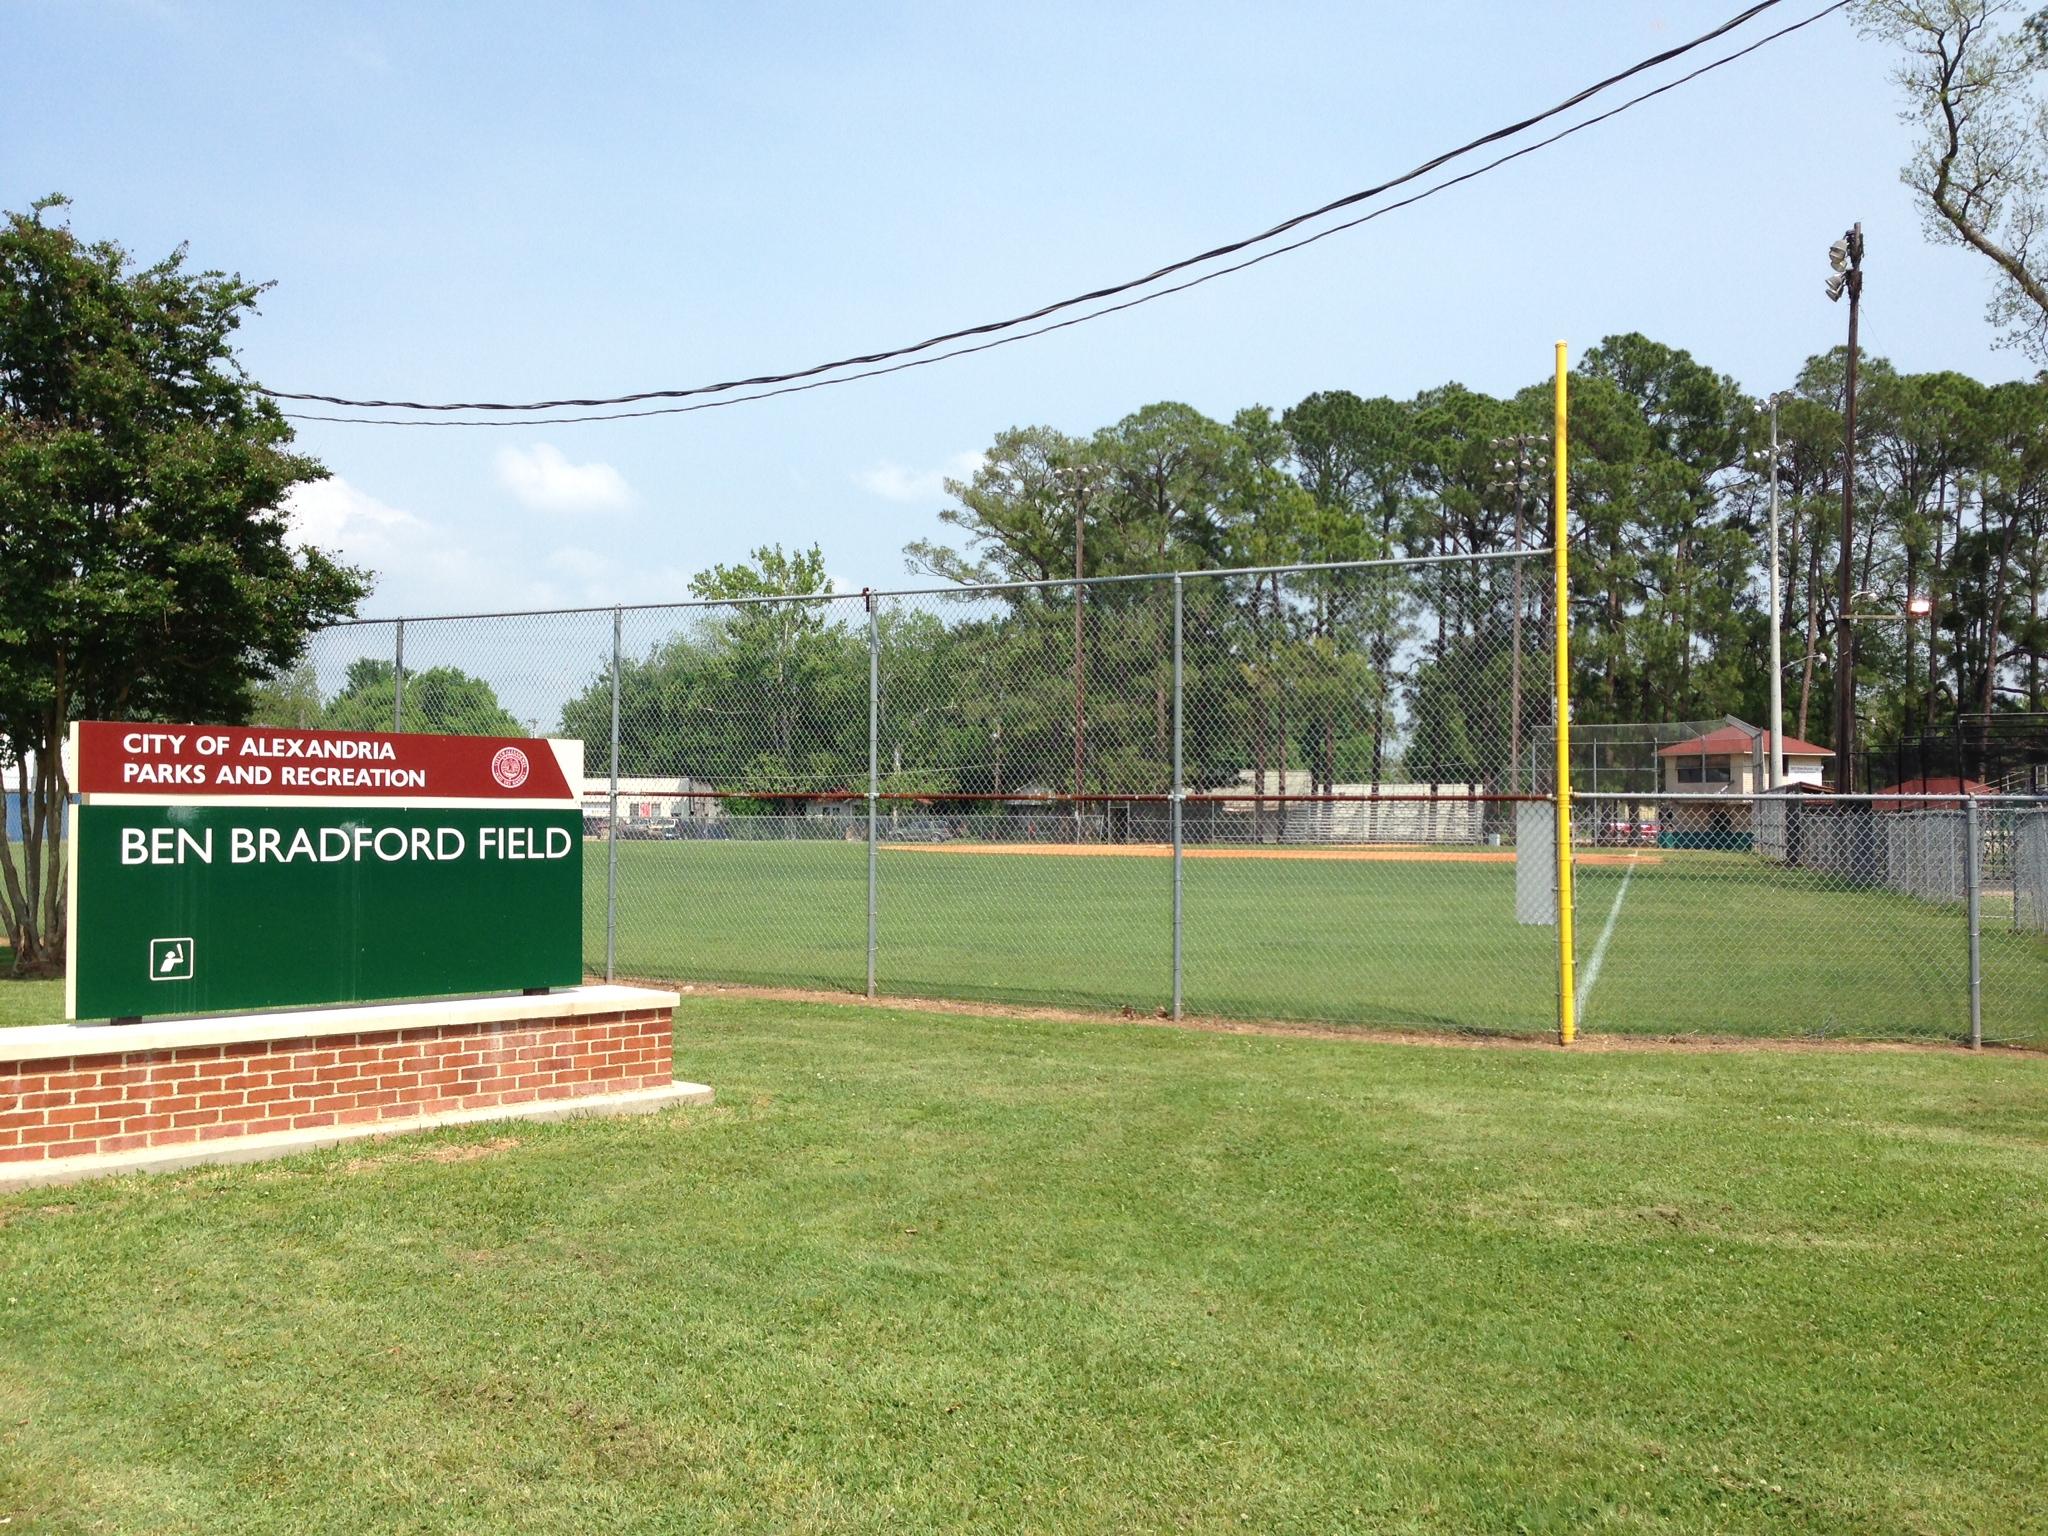 Ben Bradford Field 260' ball field